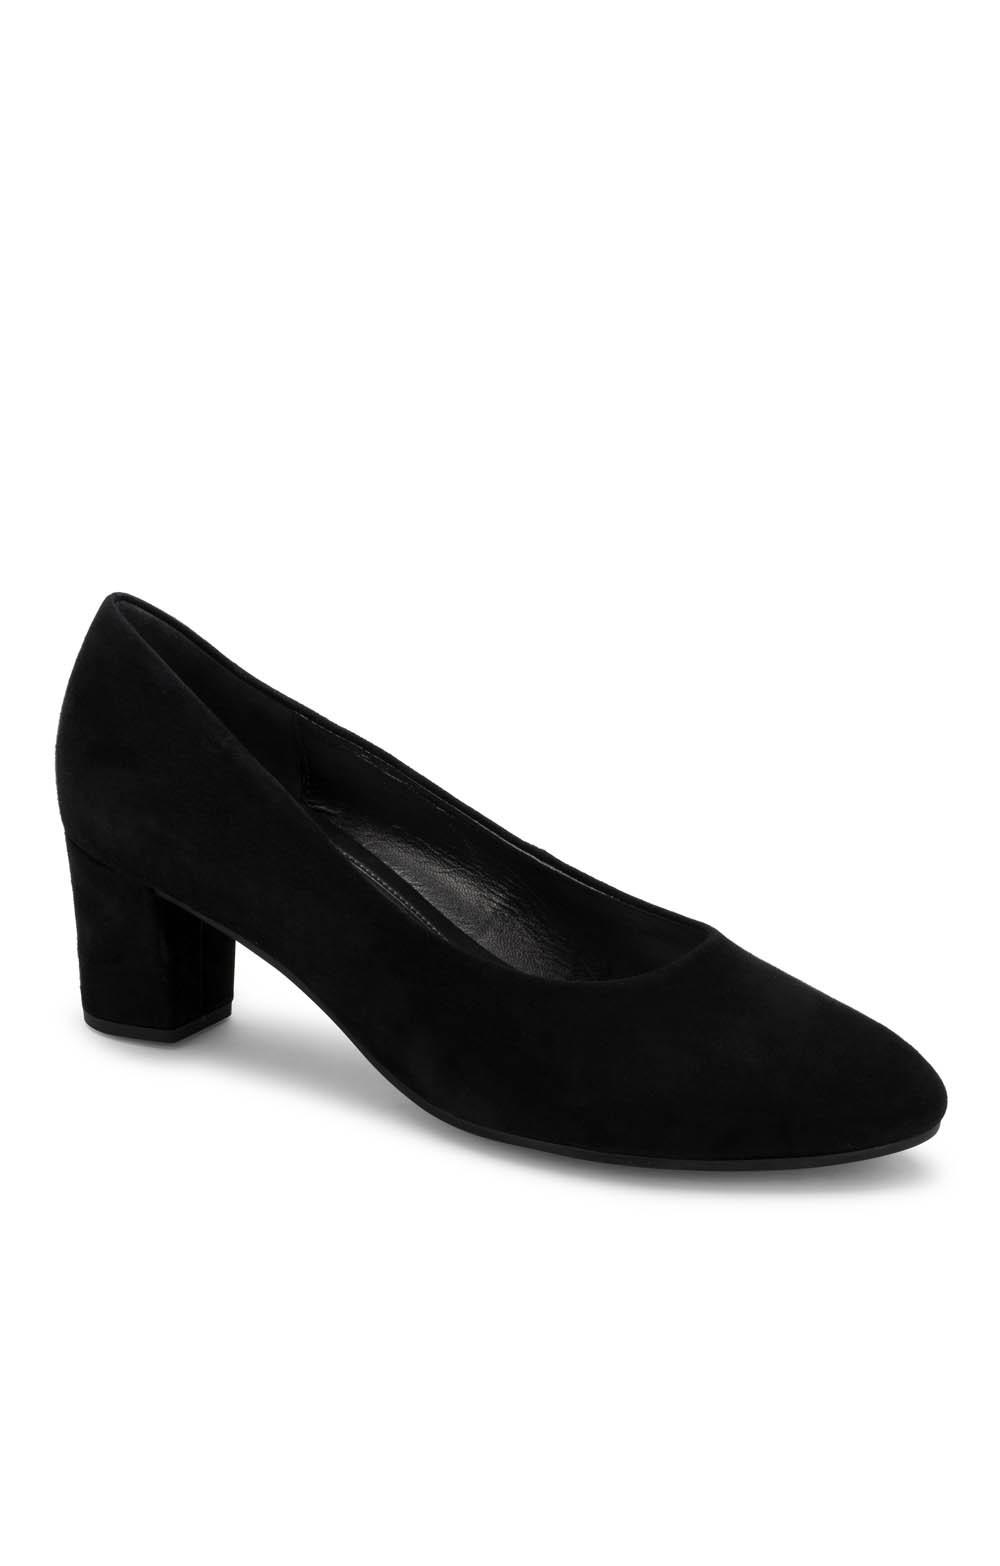 9b6f7cfb67bd8 Ladies Gabor Suede Court Shoe - House of Bruar